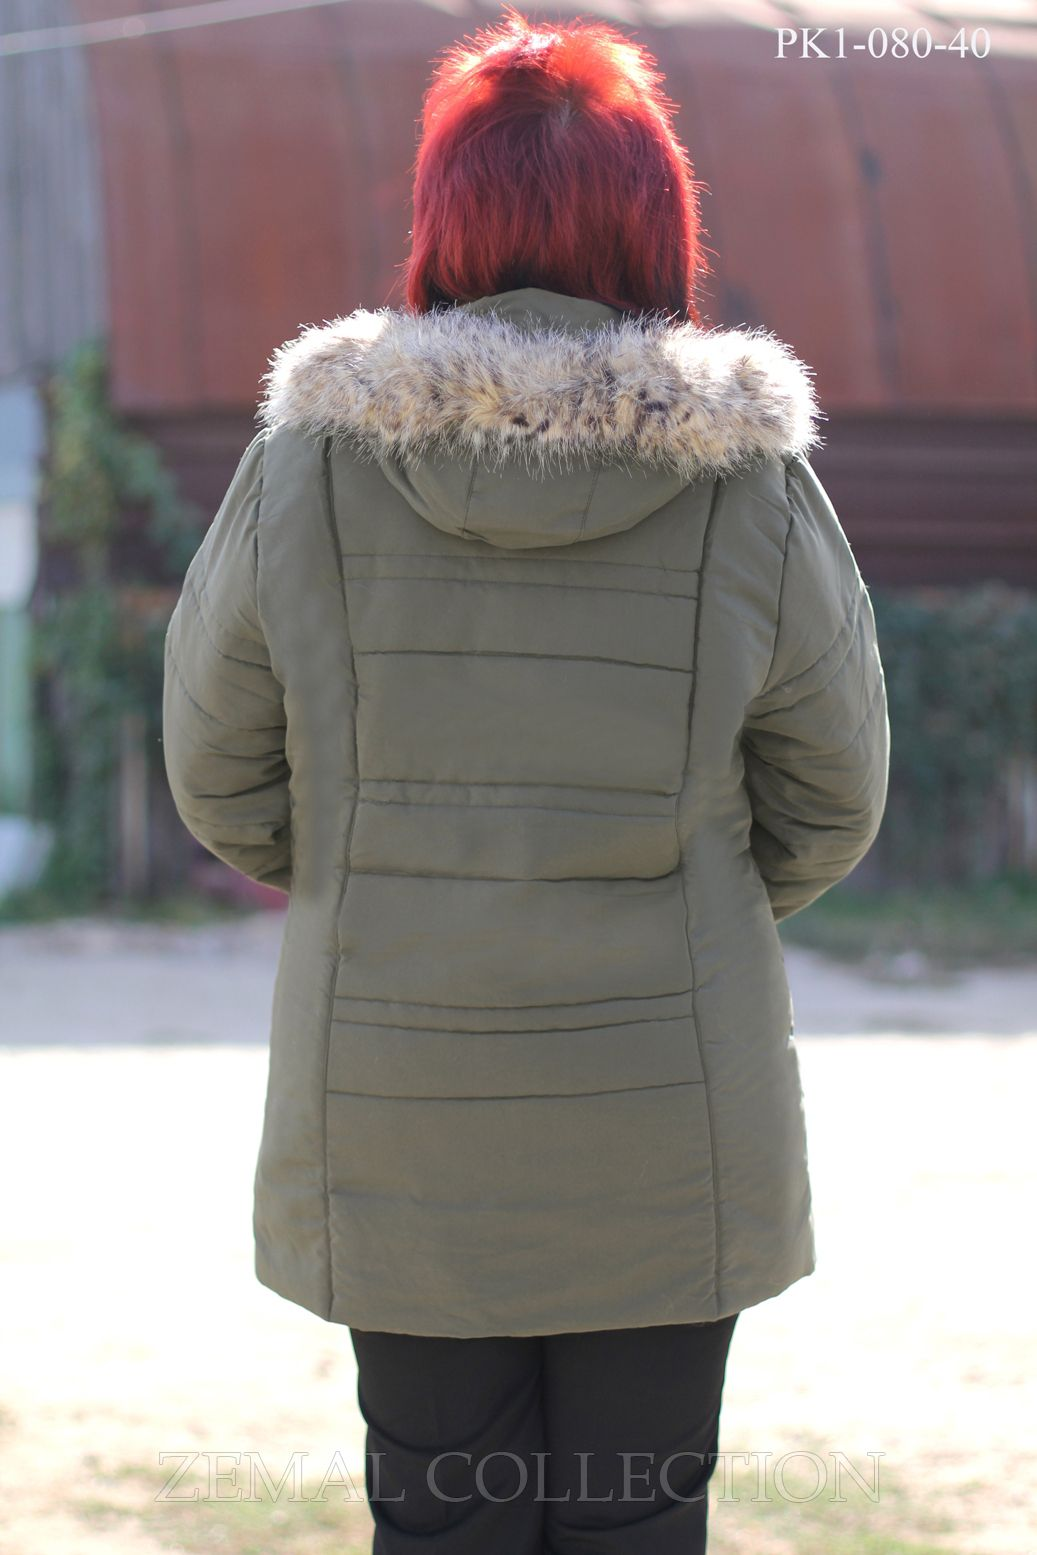 Куртка pk1-080 купить на сайте производителя